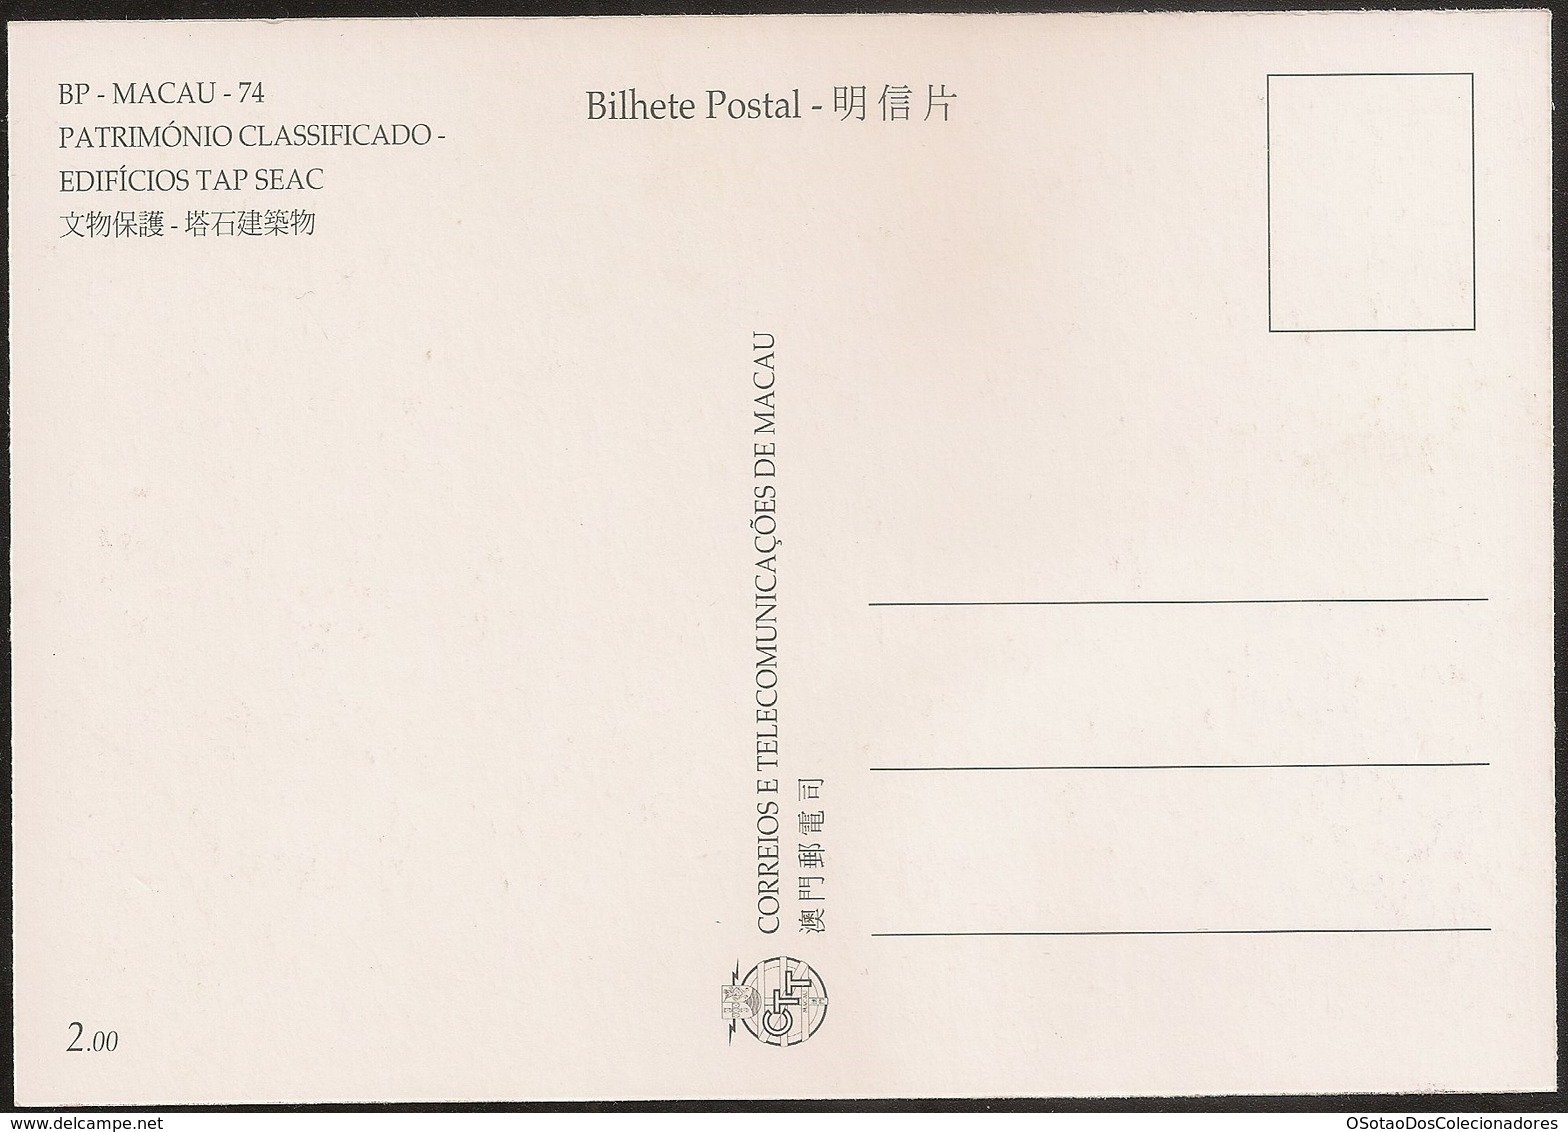 POSTAL MAXIMO - MAXIMUM CARD - Macau Macao China Portugal 1999 - Património Classificado - Edificios TAP SEAC - Interi Postali